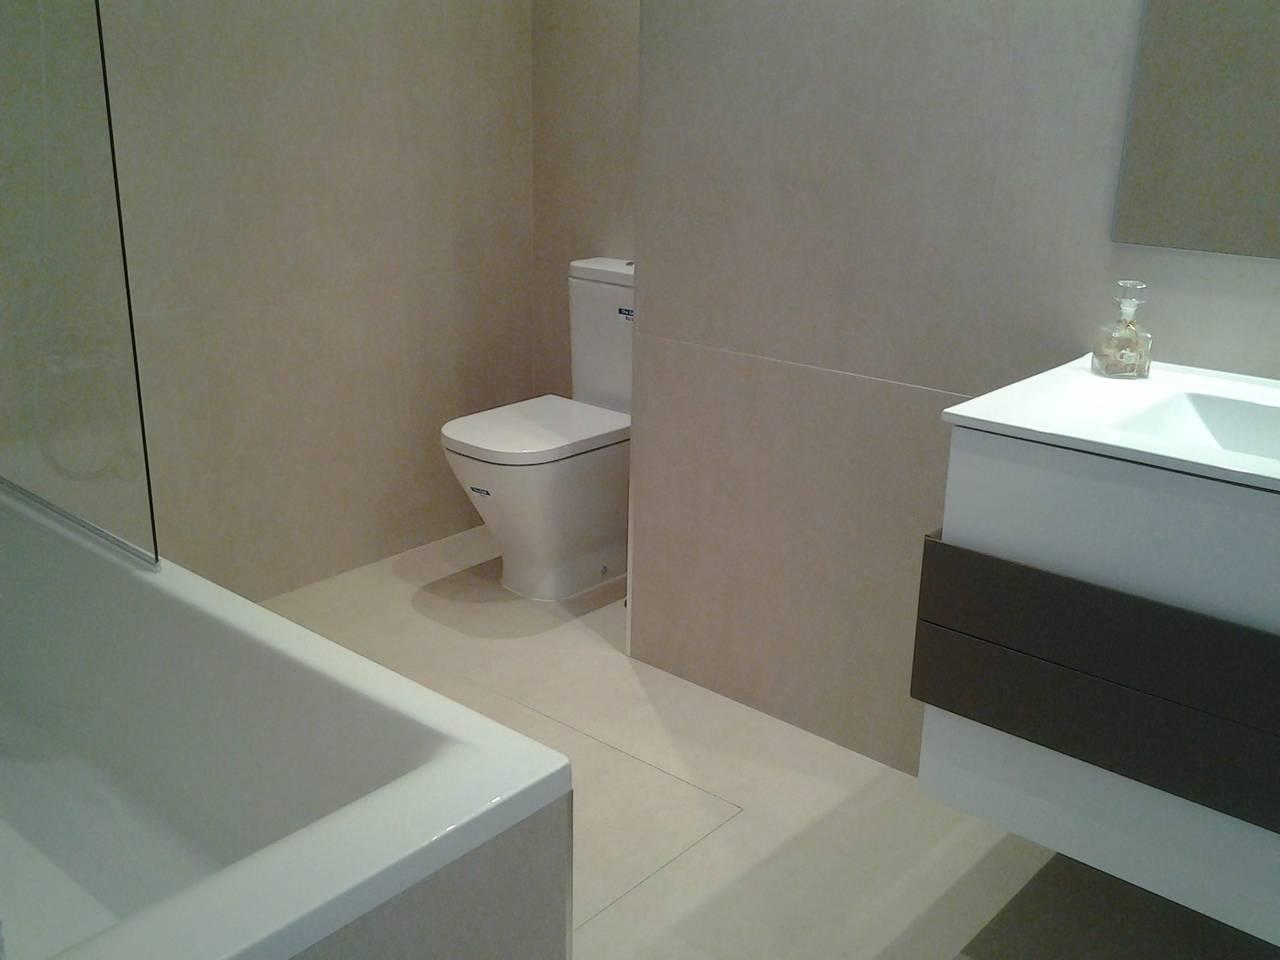 luxury 6 rooms villa with pool & jacuzzi - P.banus photo 25684319